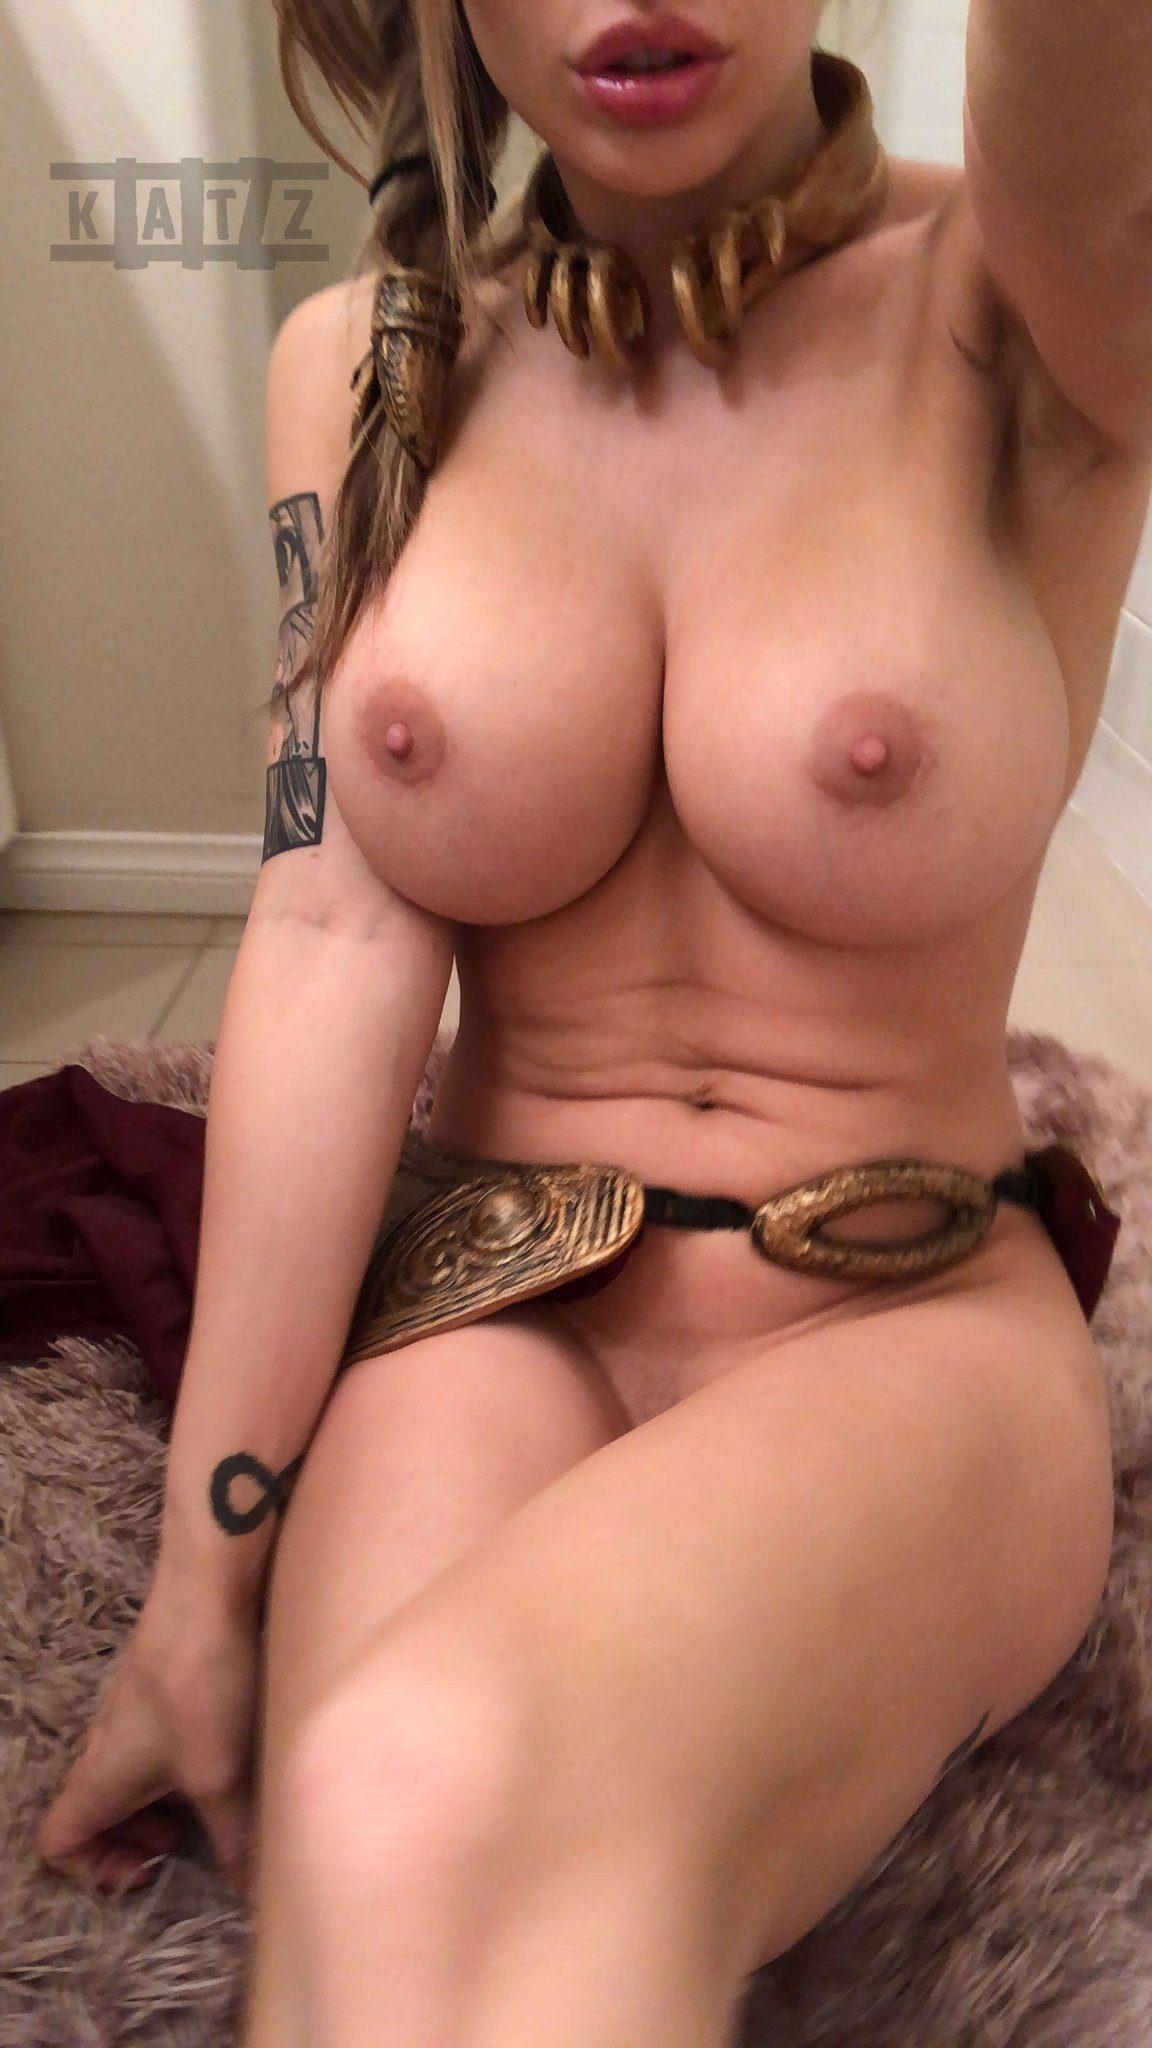 Liz Katz Slave Leia Nude Cosplay Onlyfans Leaked Photos 15